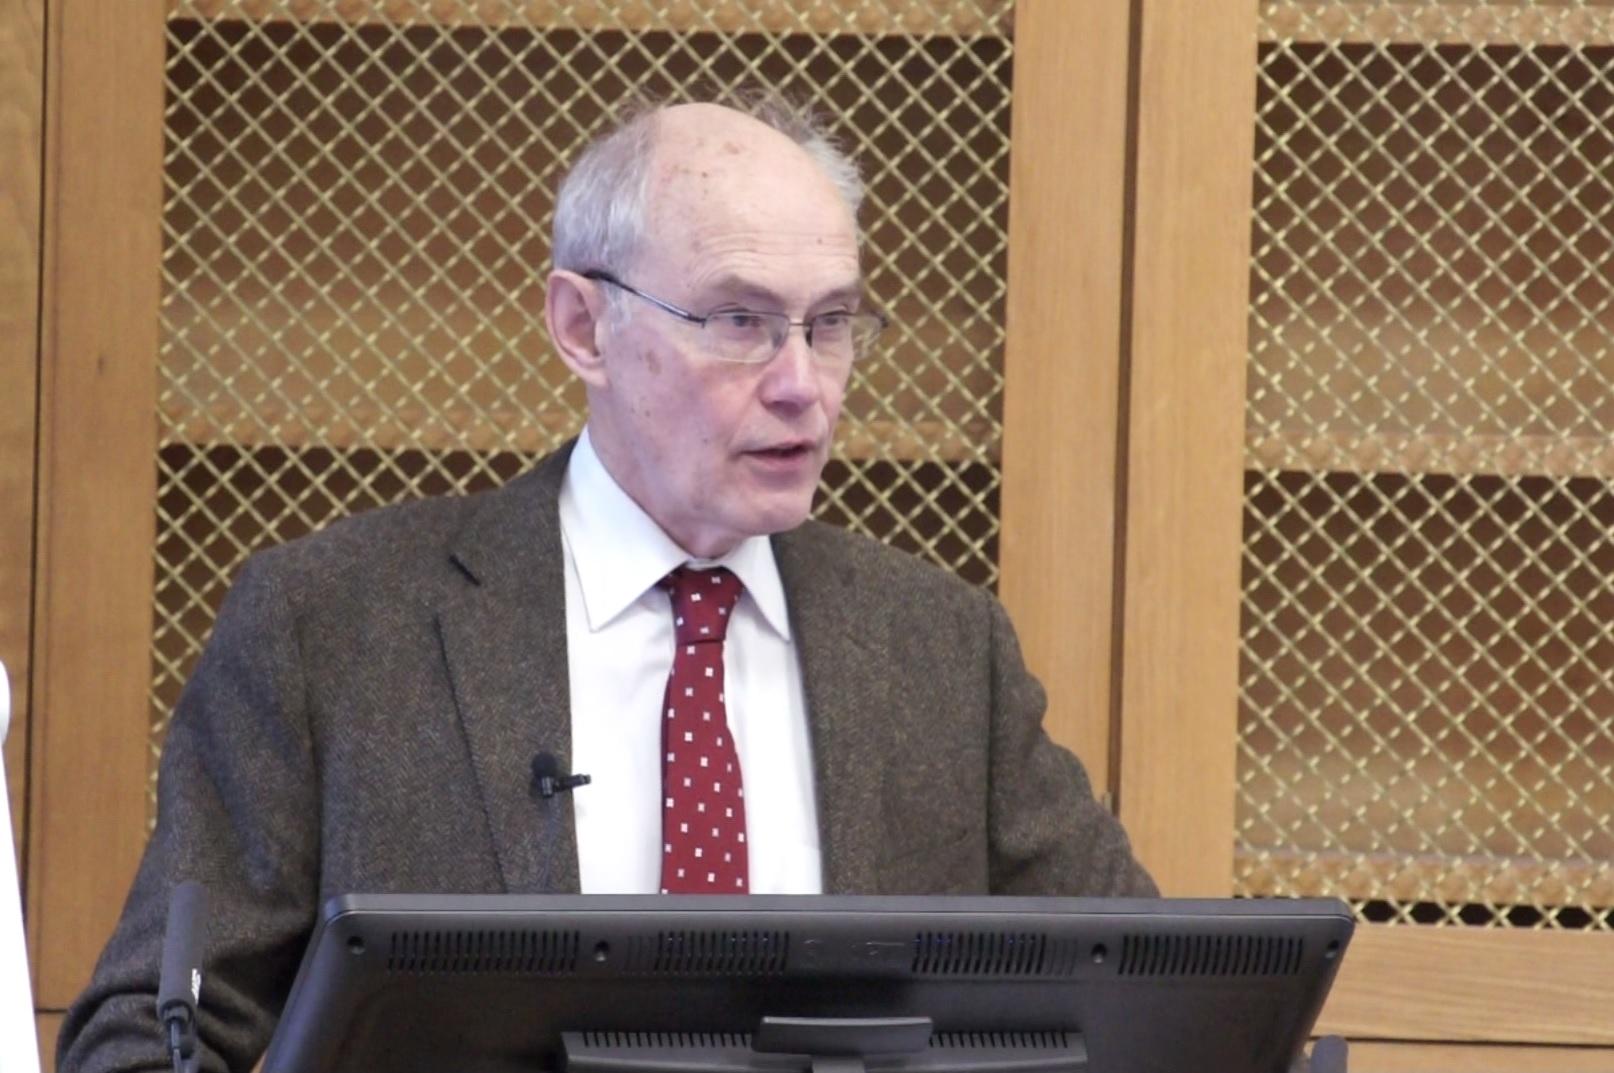 Richard Manning at a lectern